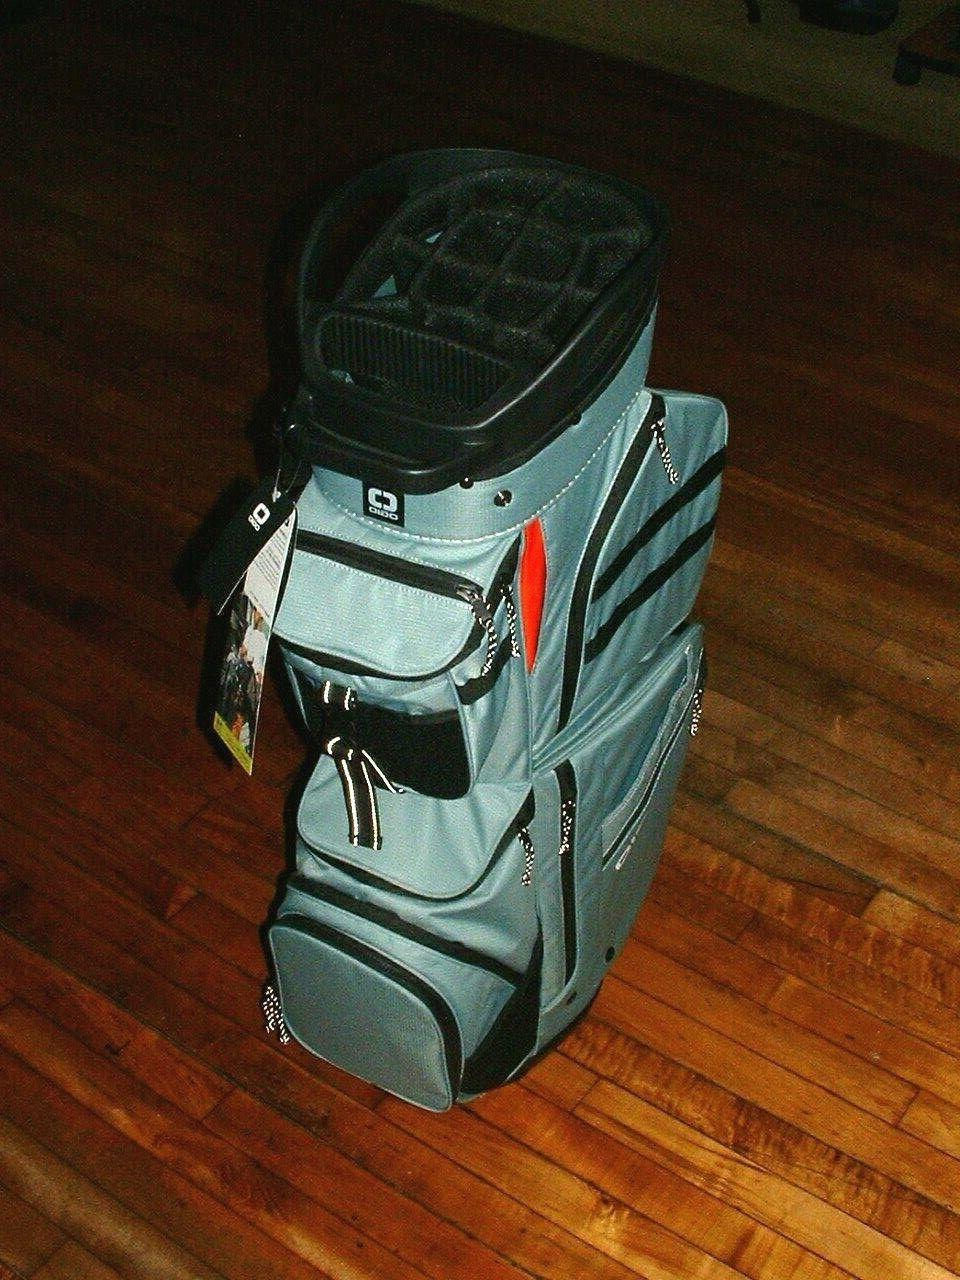 OGIO Bag 14, LIghtweight, Great New